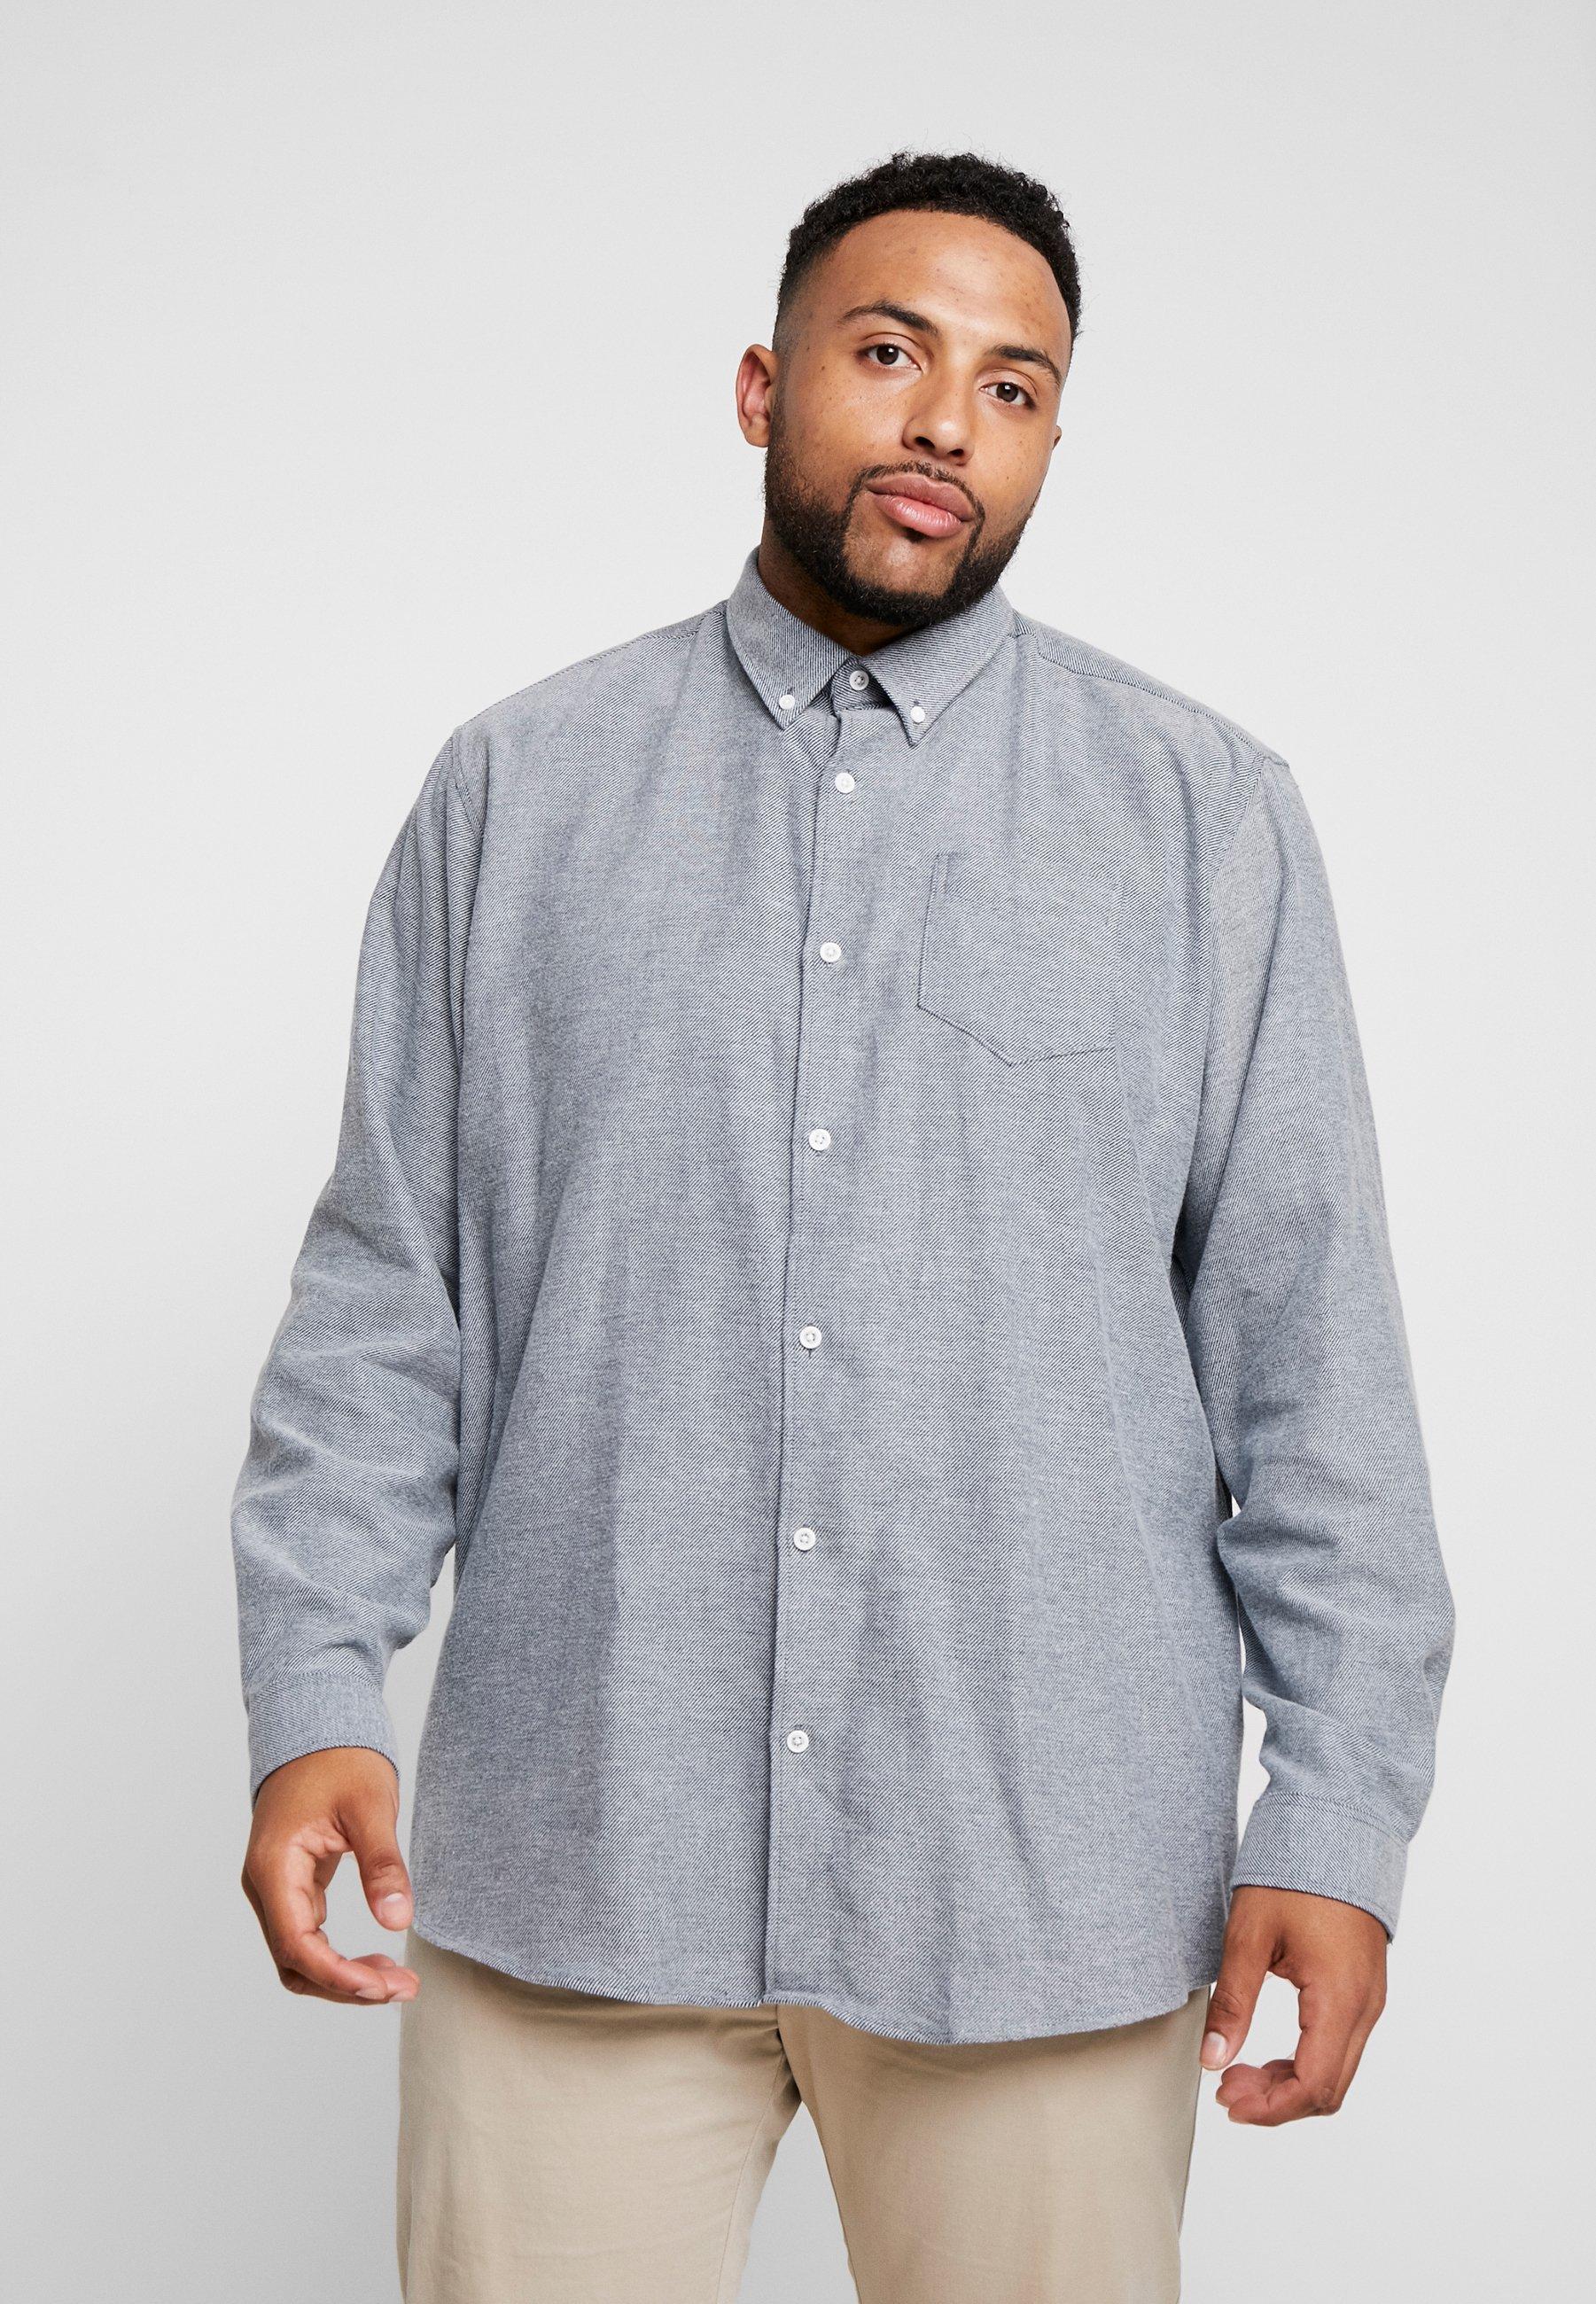 Jack´s Button DownChemise Button Navy Sportswear Sportswear Sportswear Jack´s DownChemise DownChemise Navy Jack´s Button f76vYgby